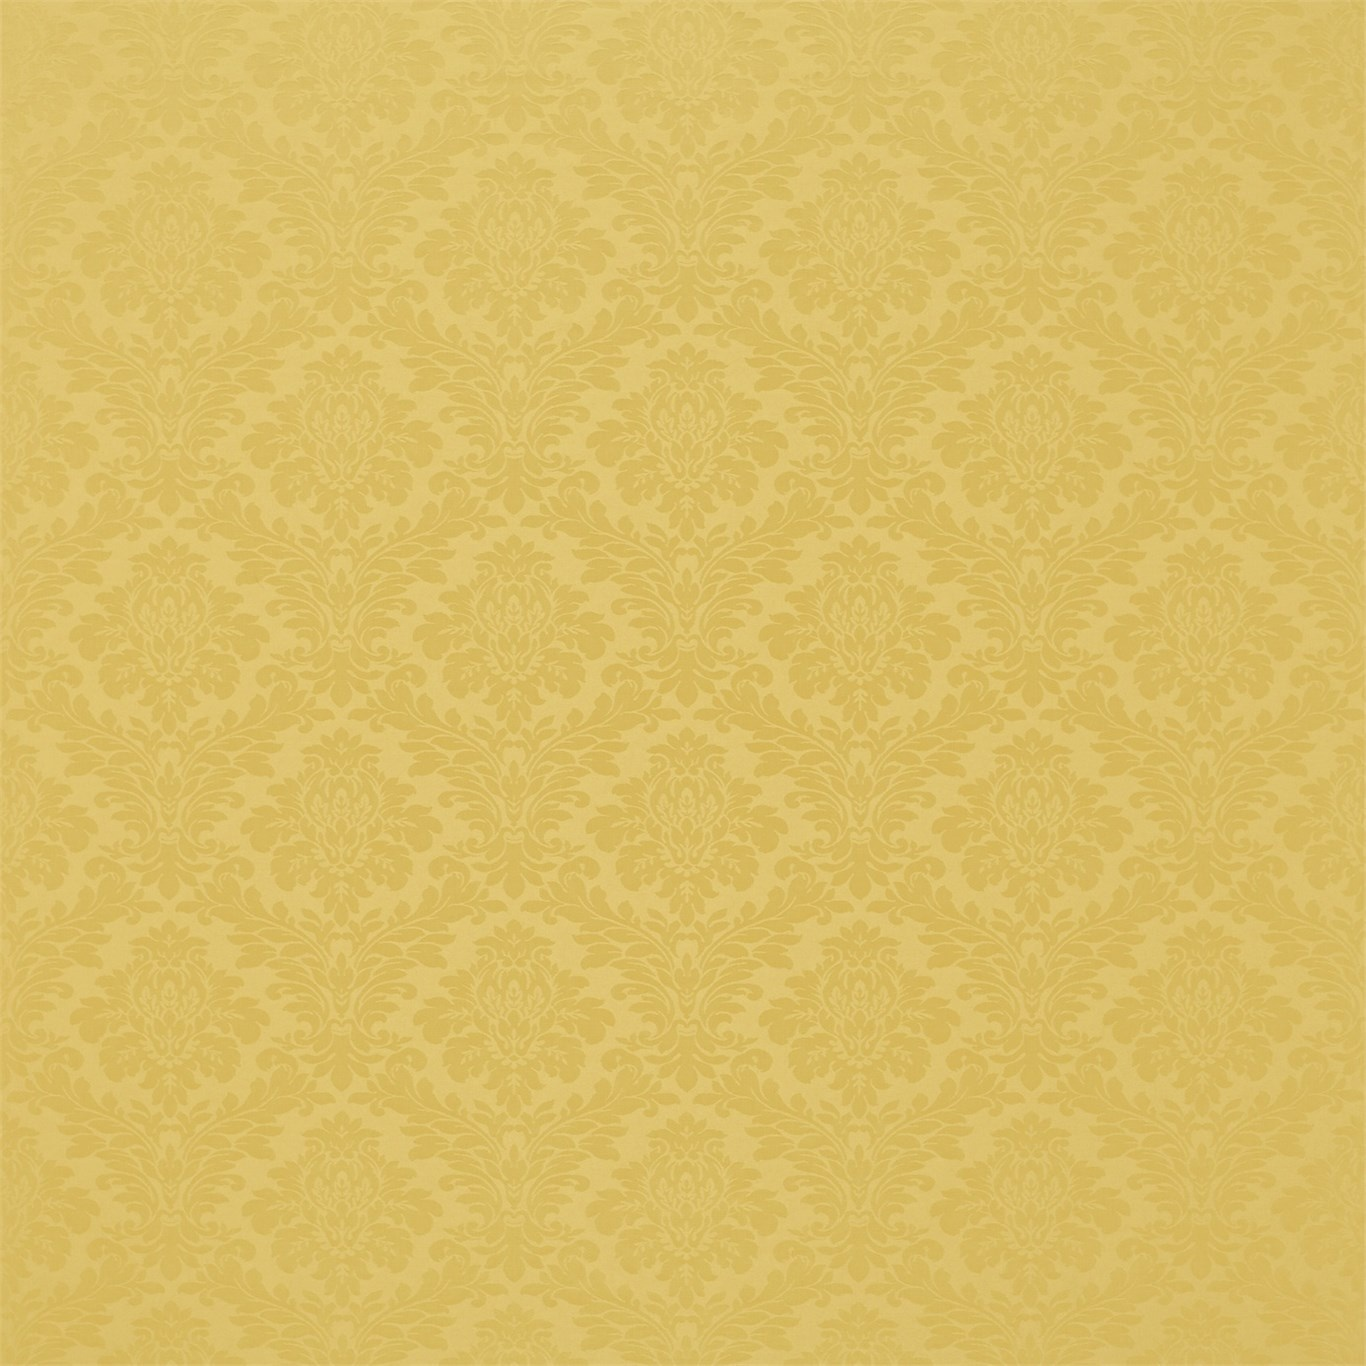 Image of Sanderson Lymington Damask Corn Fabric 232621